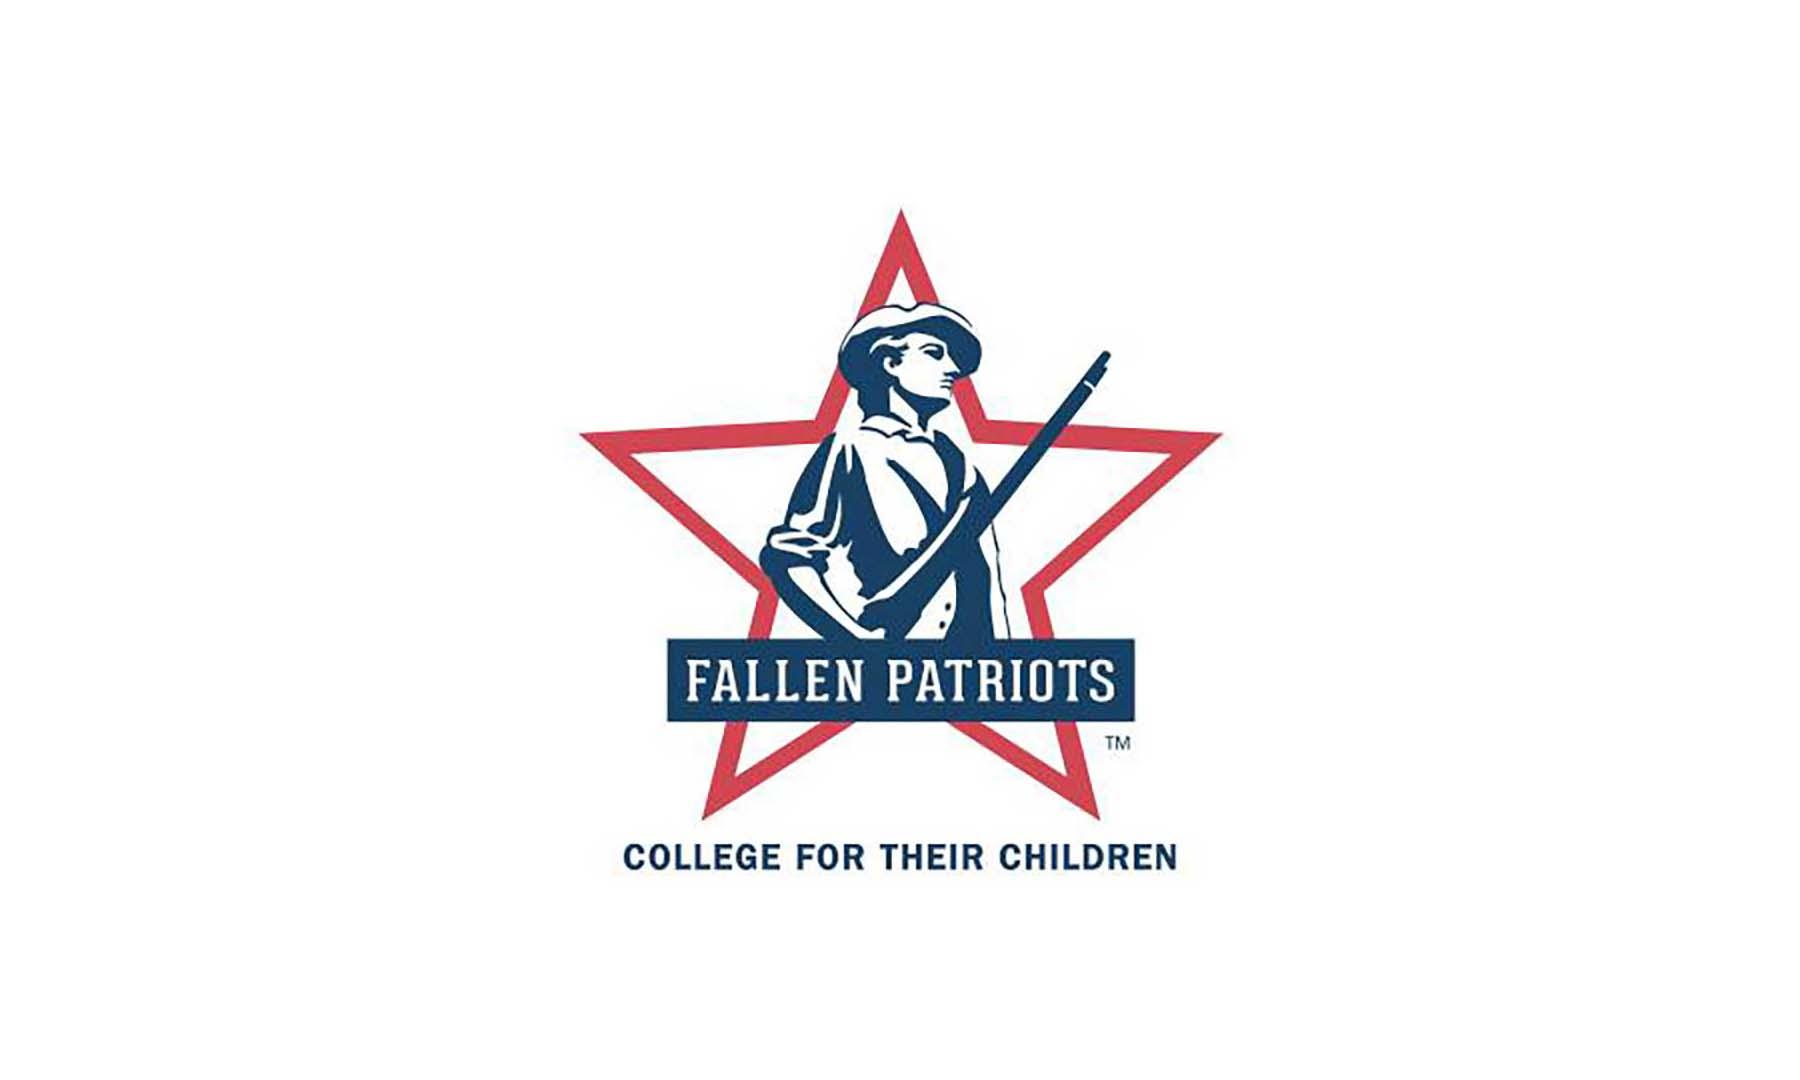 Fallen Patriots logo